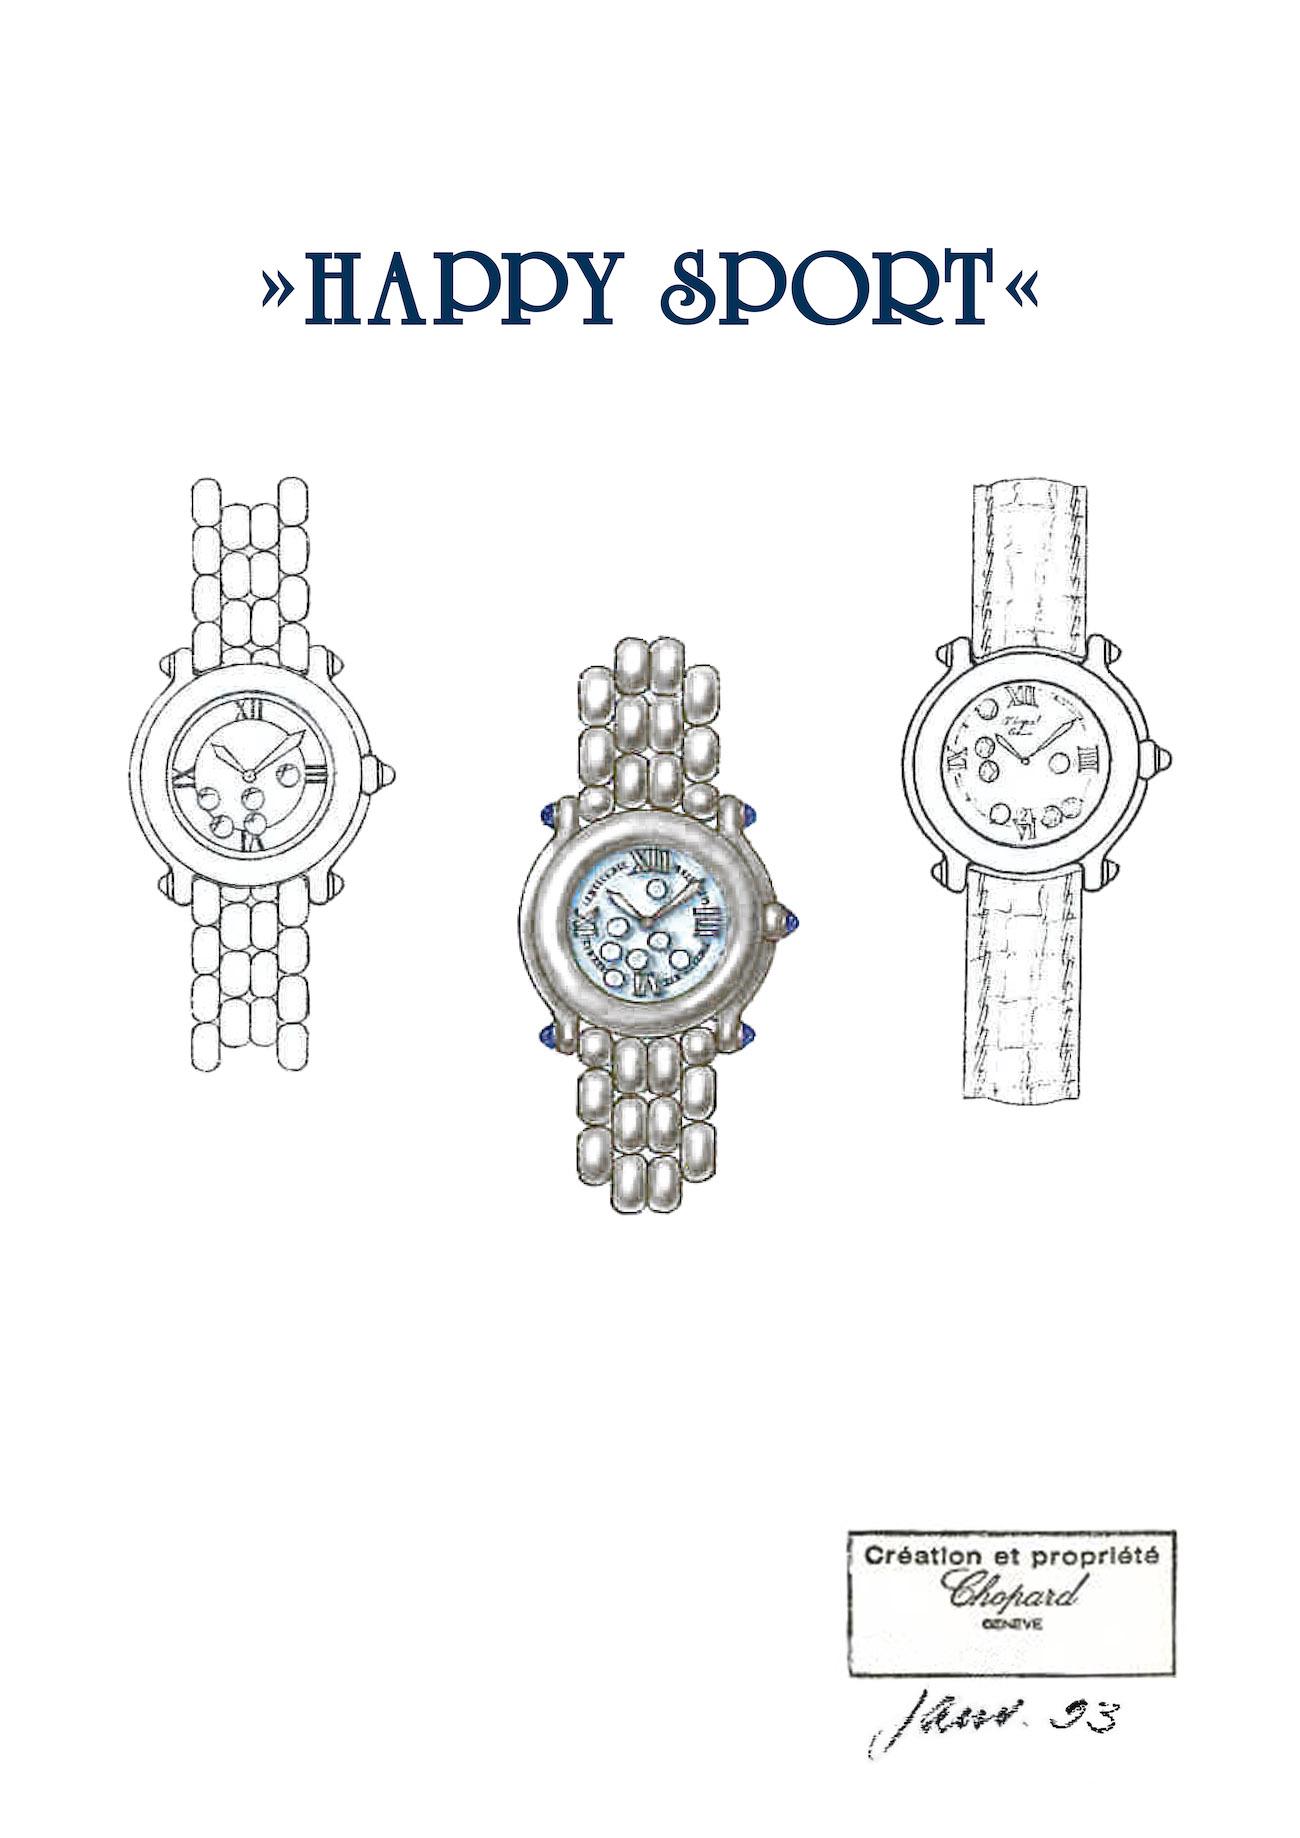 Chopard Happy Sport sketch from 1993